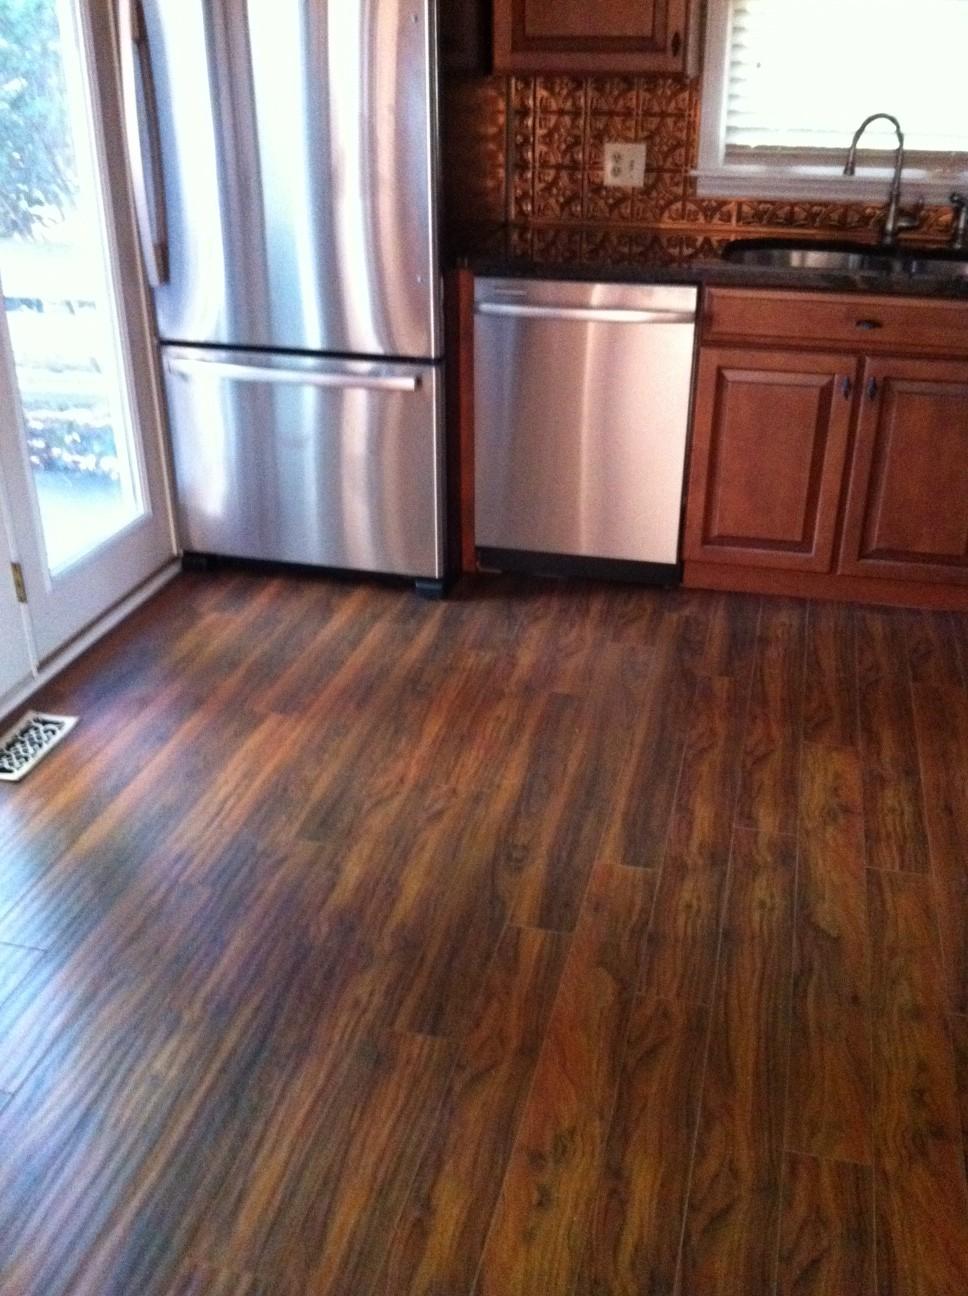 Hardwood floor vs Laminate The Pros and Cons  HomesFeed